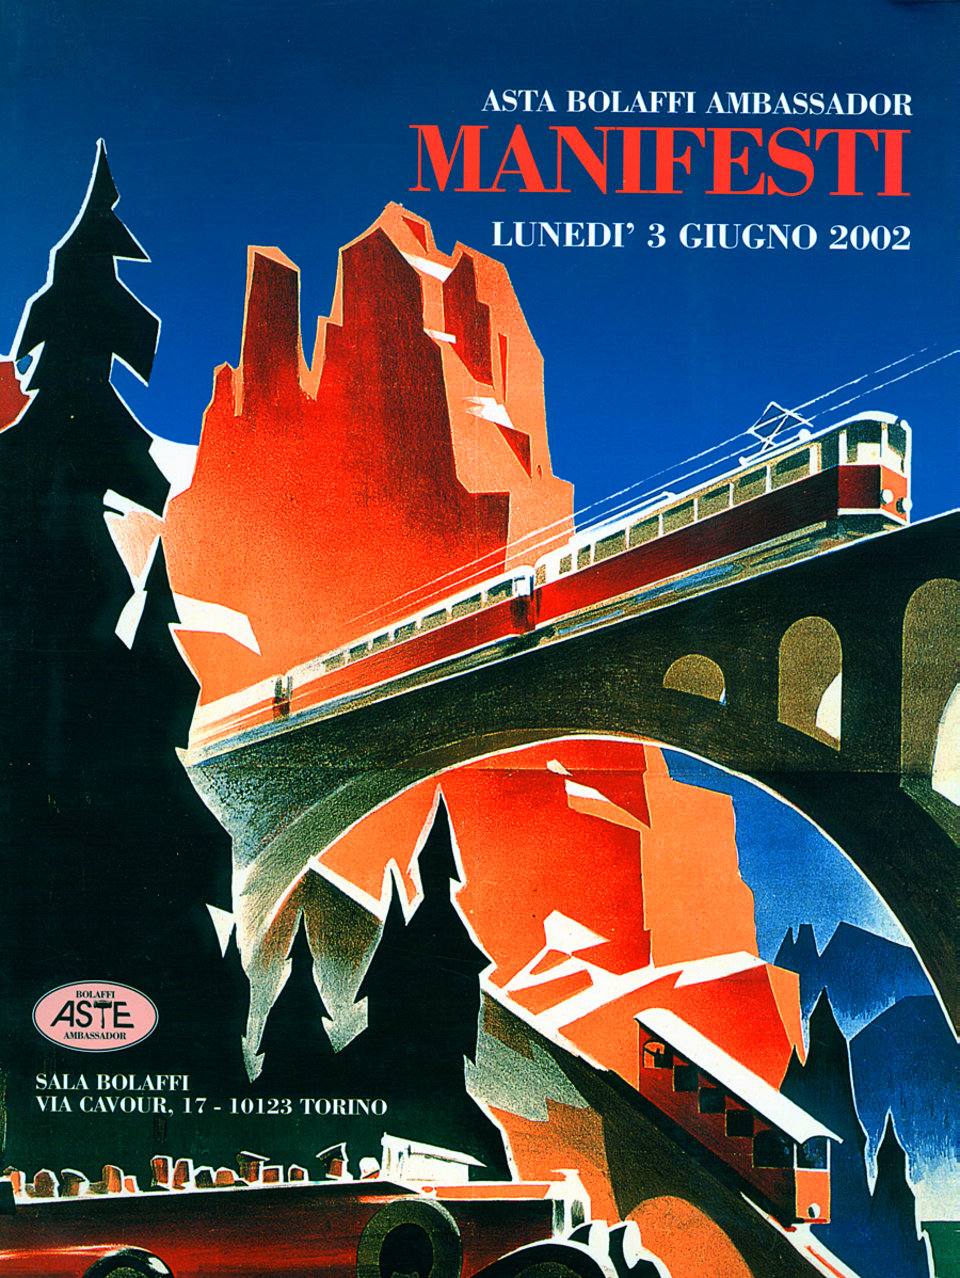 Asta Bolaffi Ambassador: Manifesti 2002 Italian Catalog